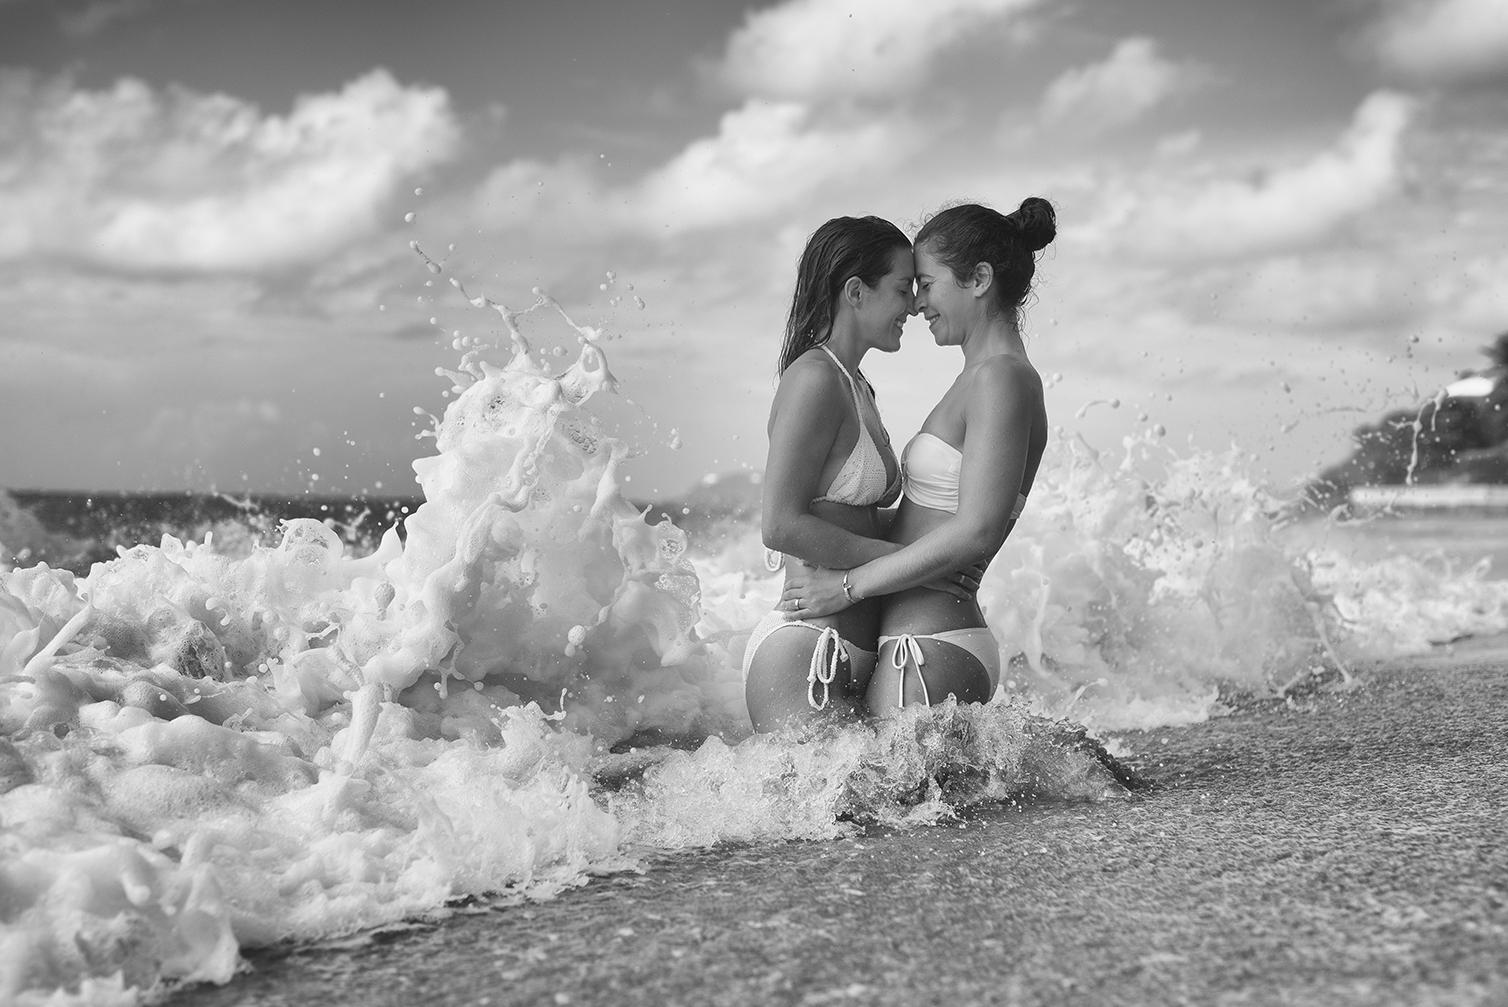 Love for Water038.jpg